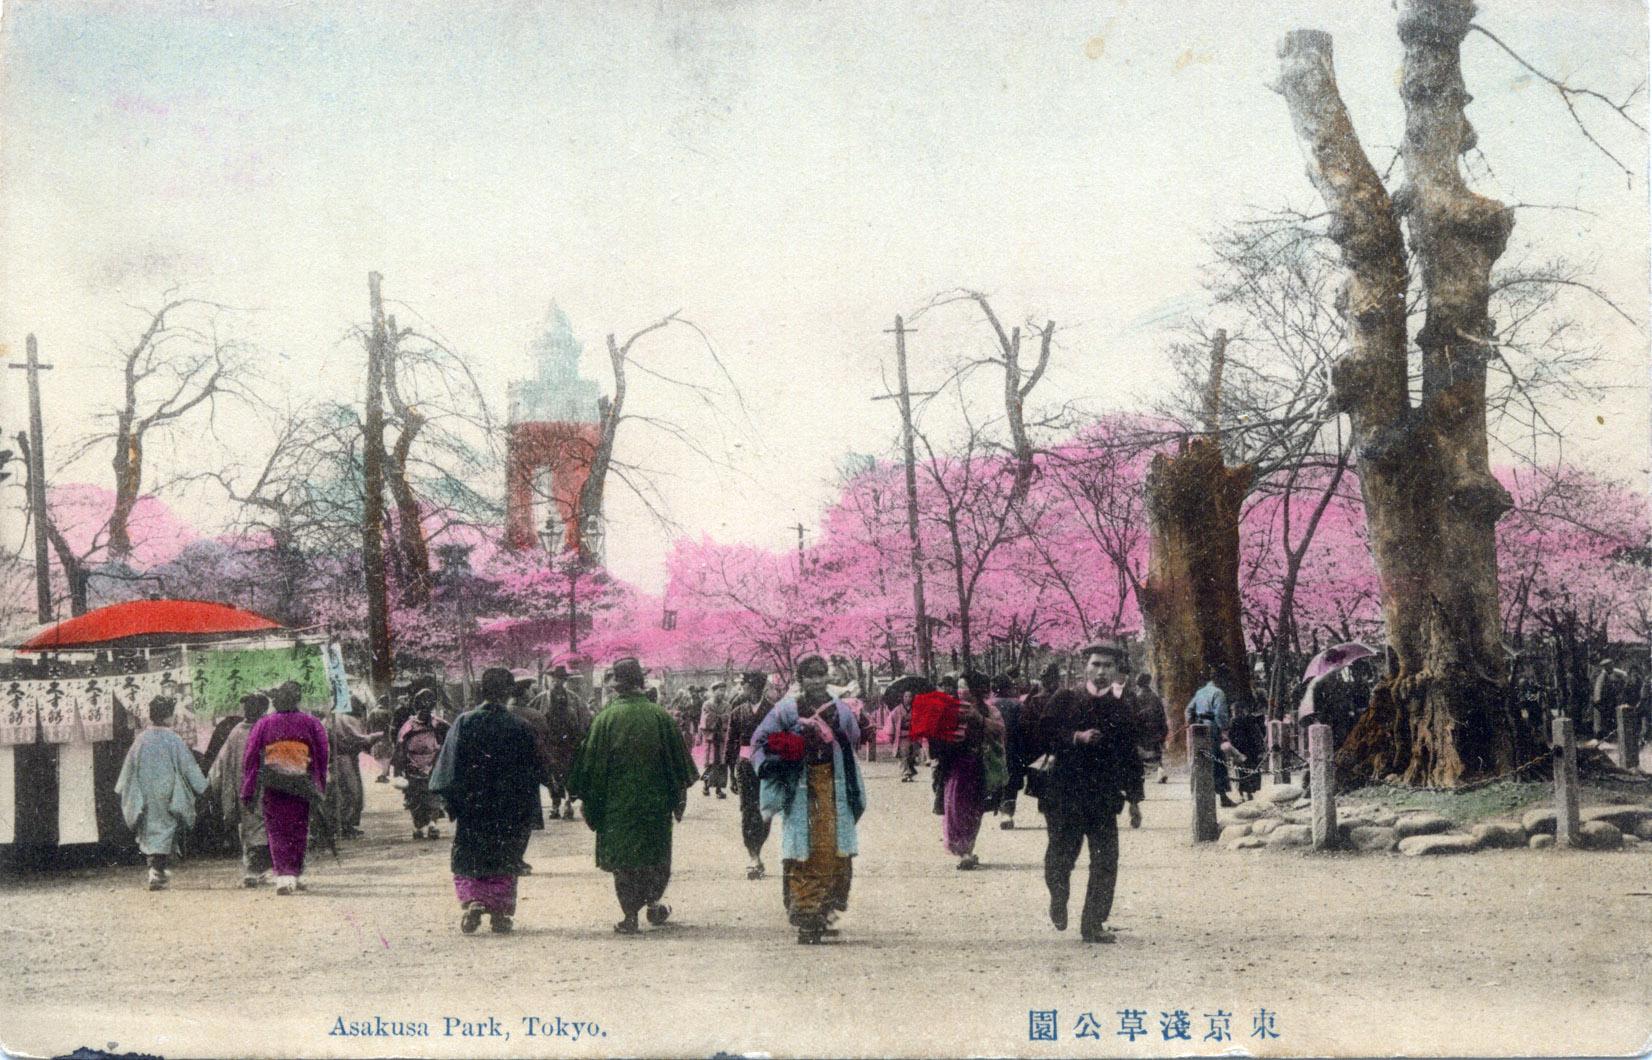 asakusa-park-blossom-300.jpg